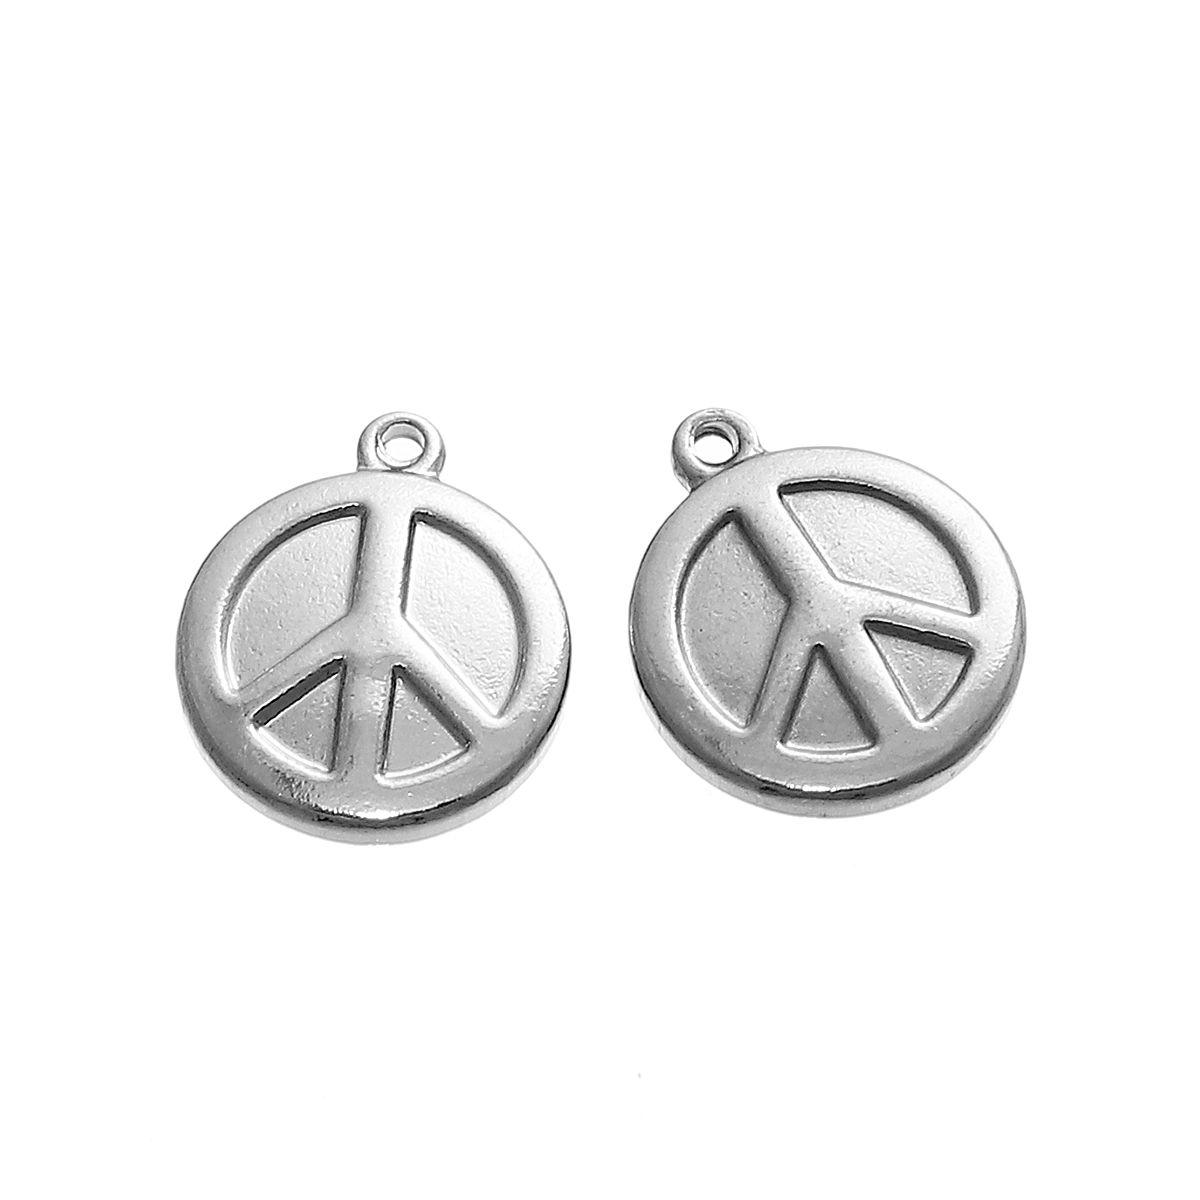 Edelstahl Metallanhänger Peace - 1 Stk. - Silber